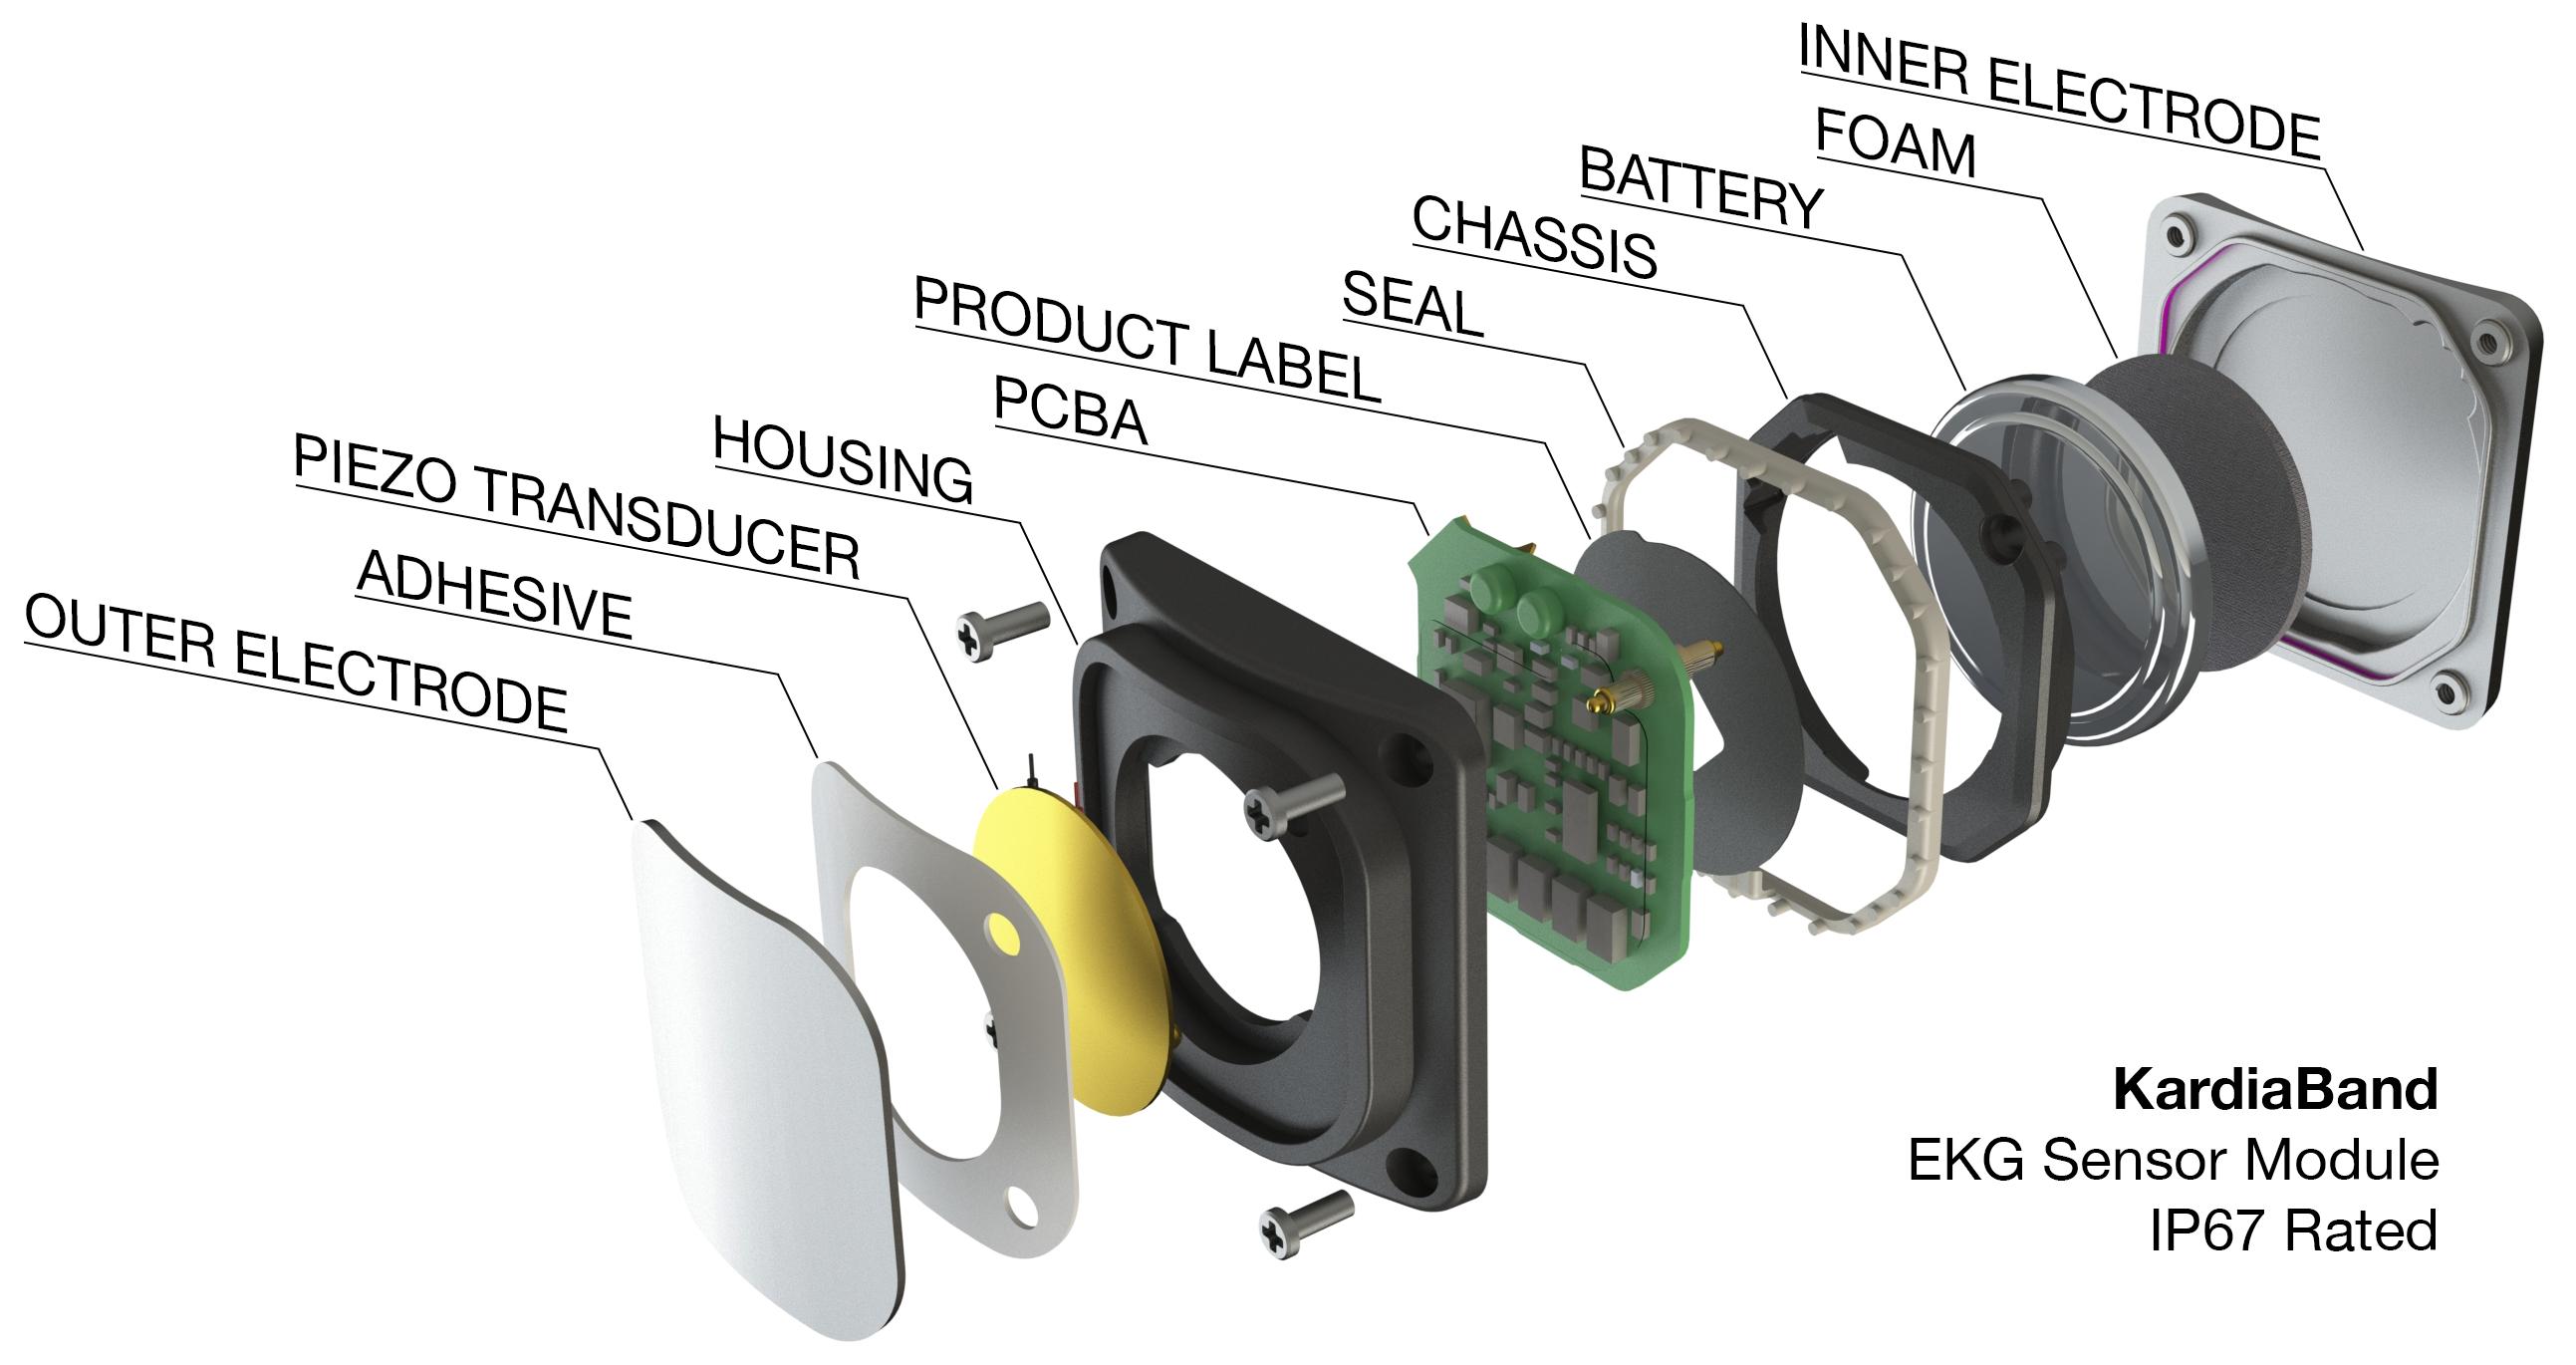 EKG Sensor module for the KardiaBand